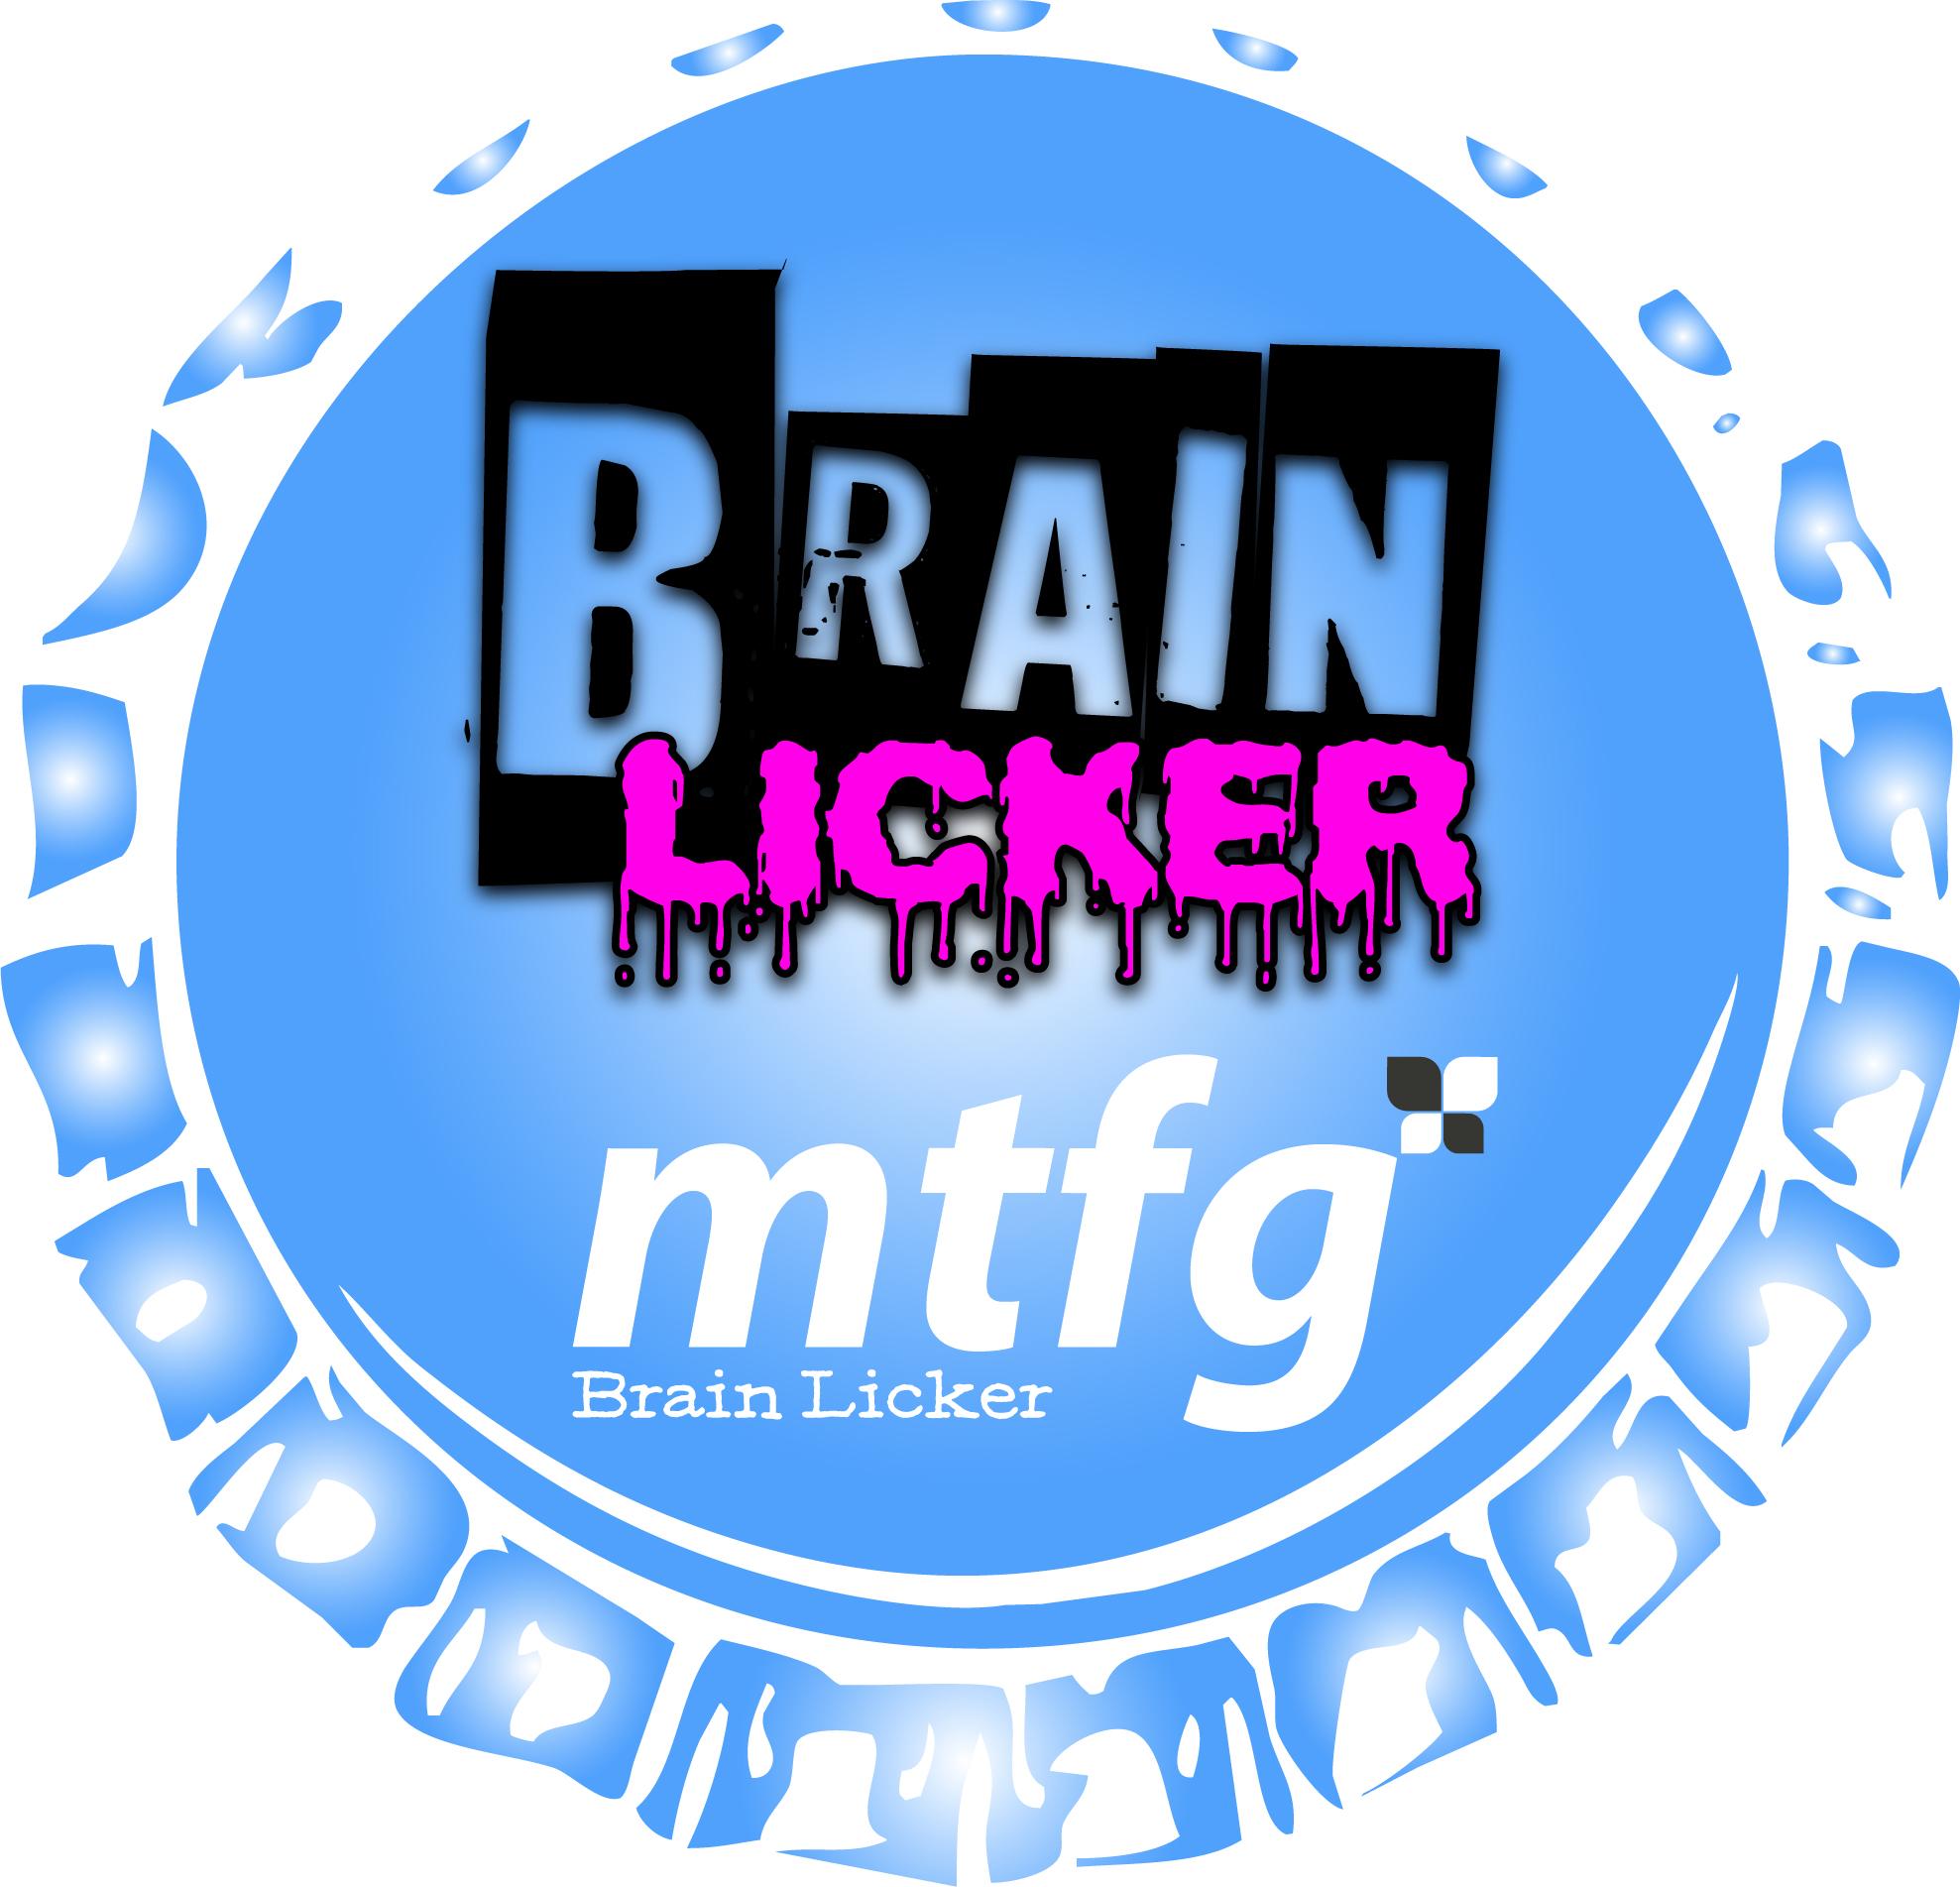 MTFG Brain Licker